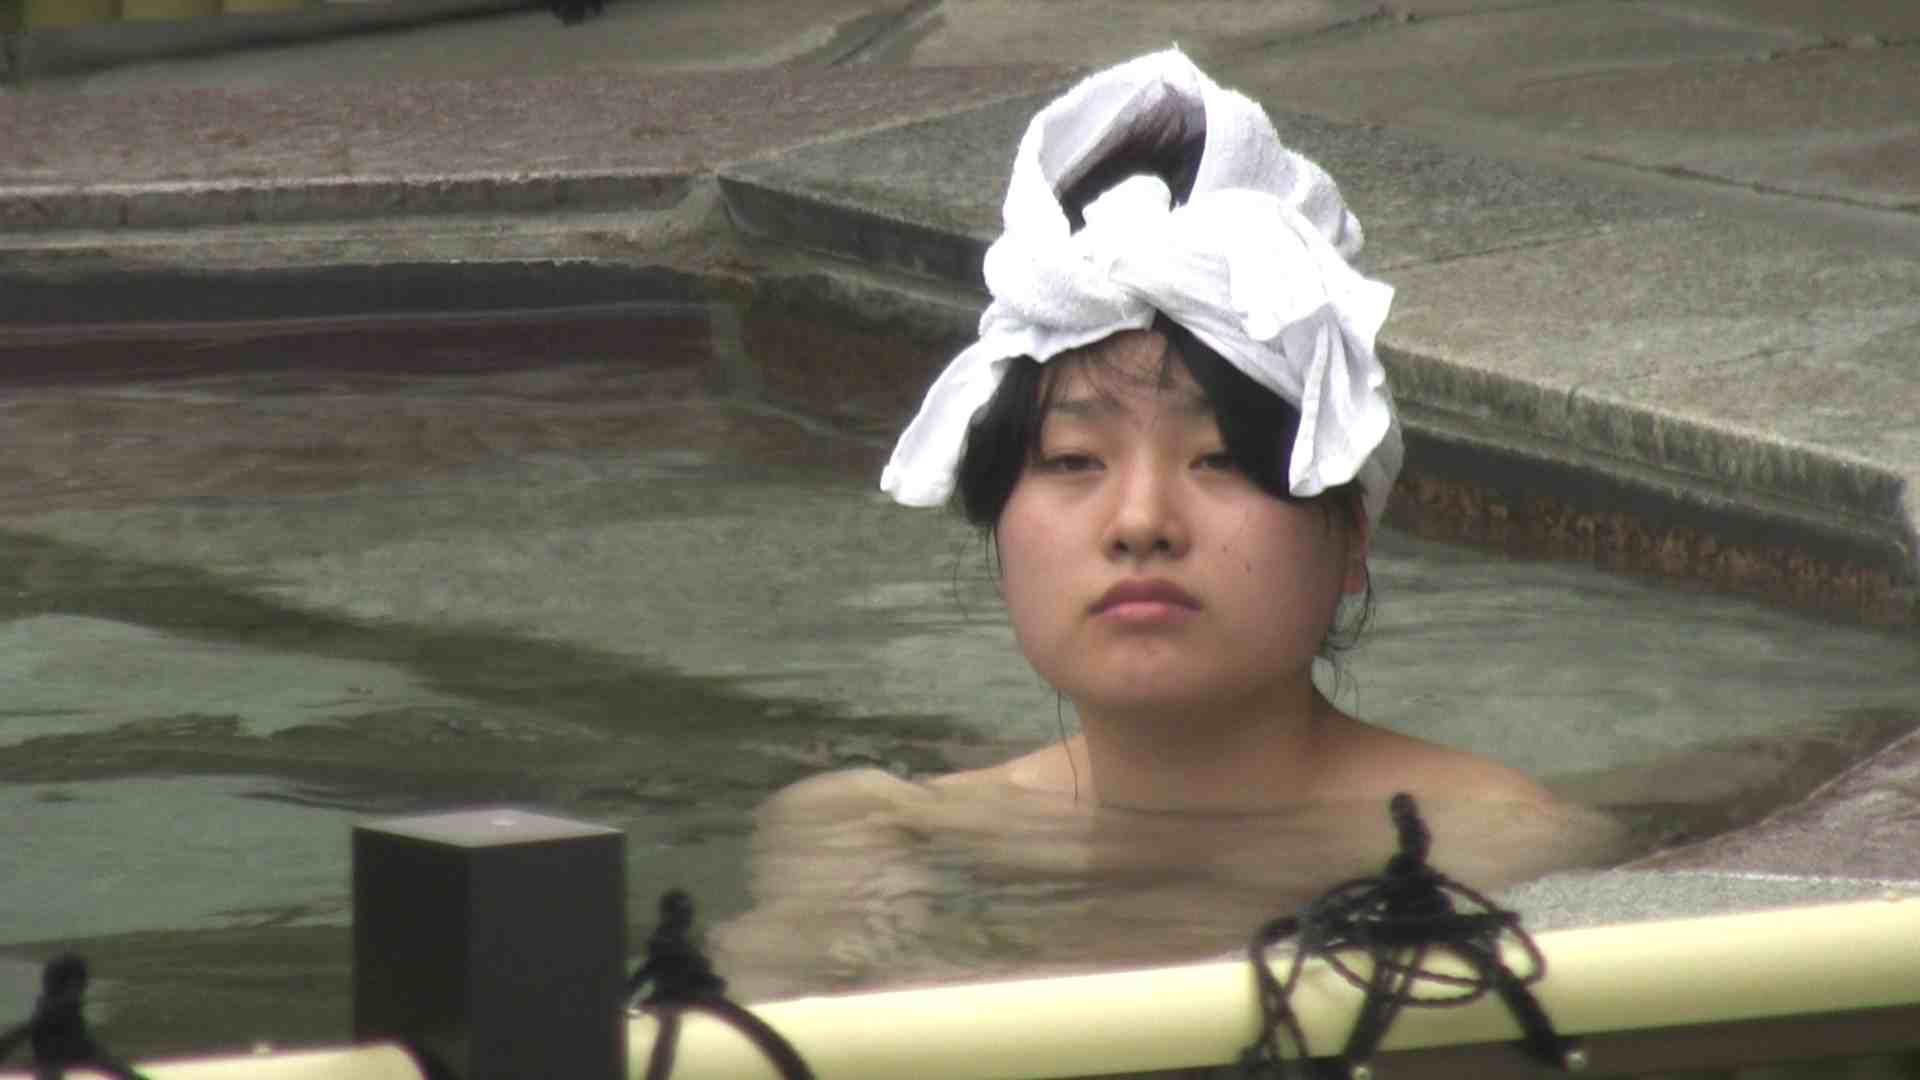 Aquaな露天風呂Vol.185 盗撮   HなOL  102pic 58